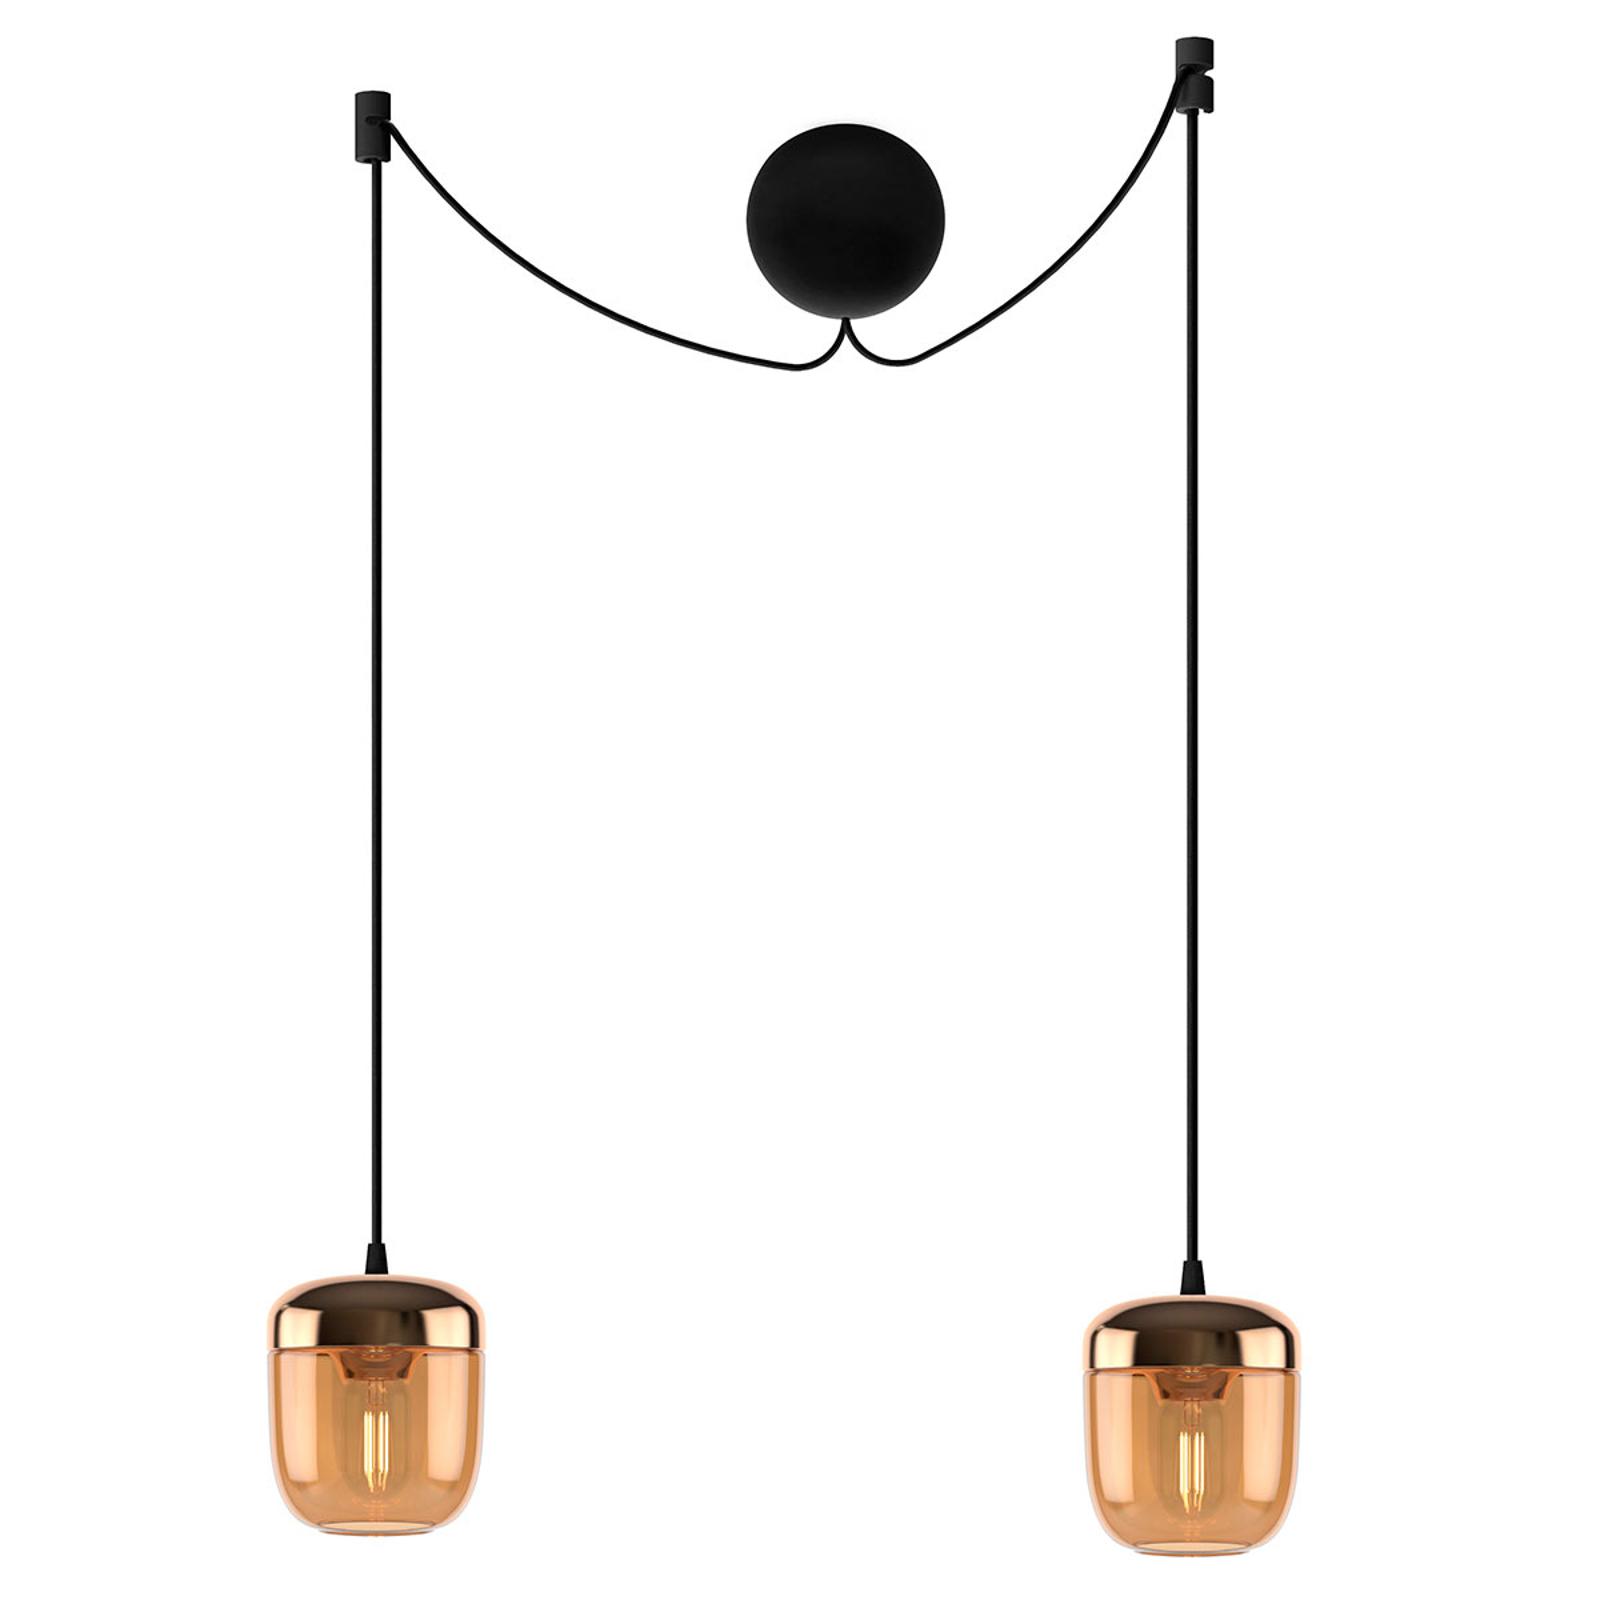 UMAGE Acorn hanglamp 2 lampje aardewerk staal